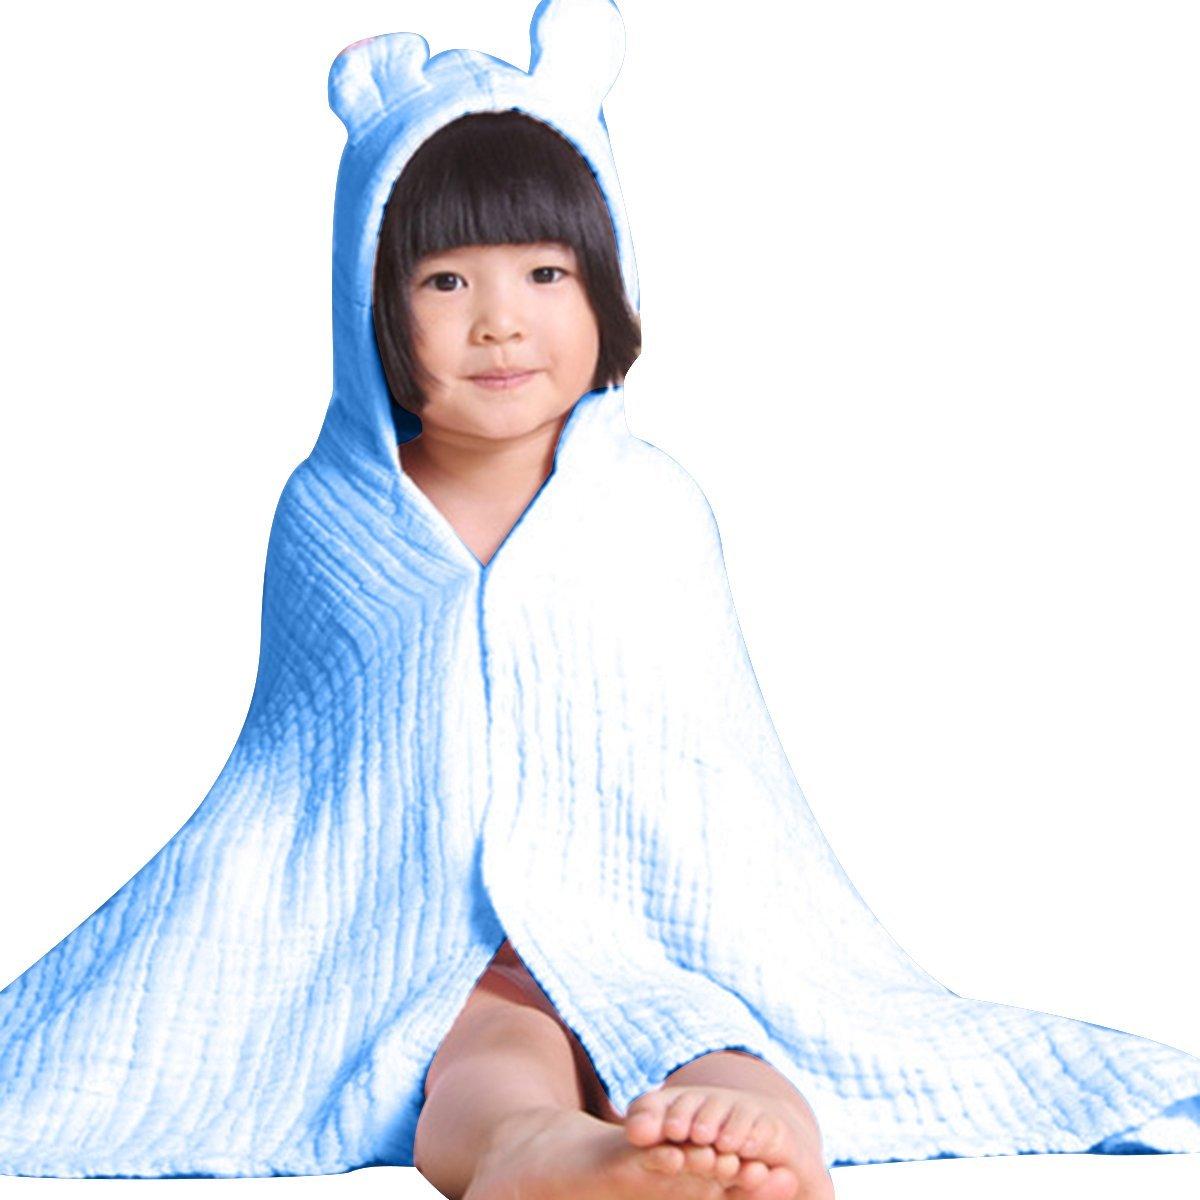 1b0813f928 Get Quotations · Kids Child Hooded Bathrobe Bath Towel Wrap